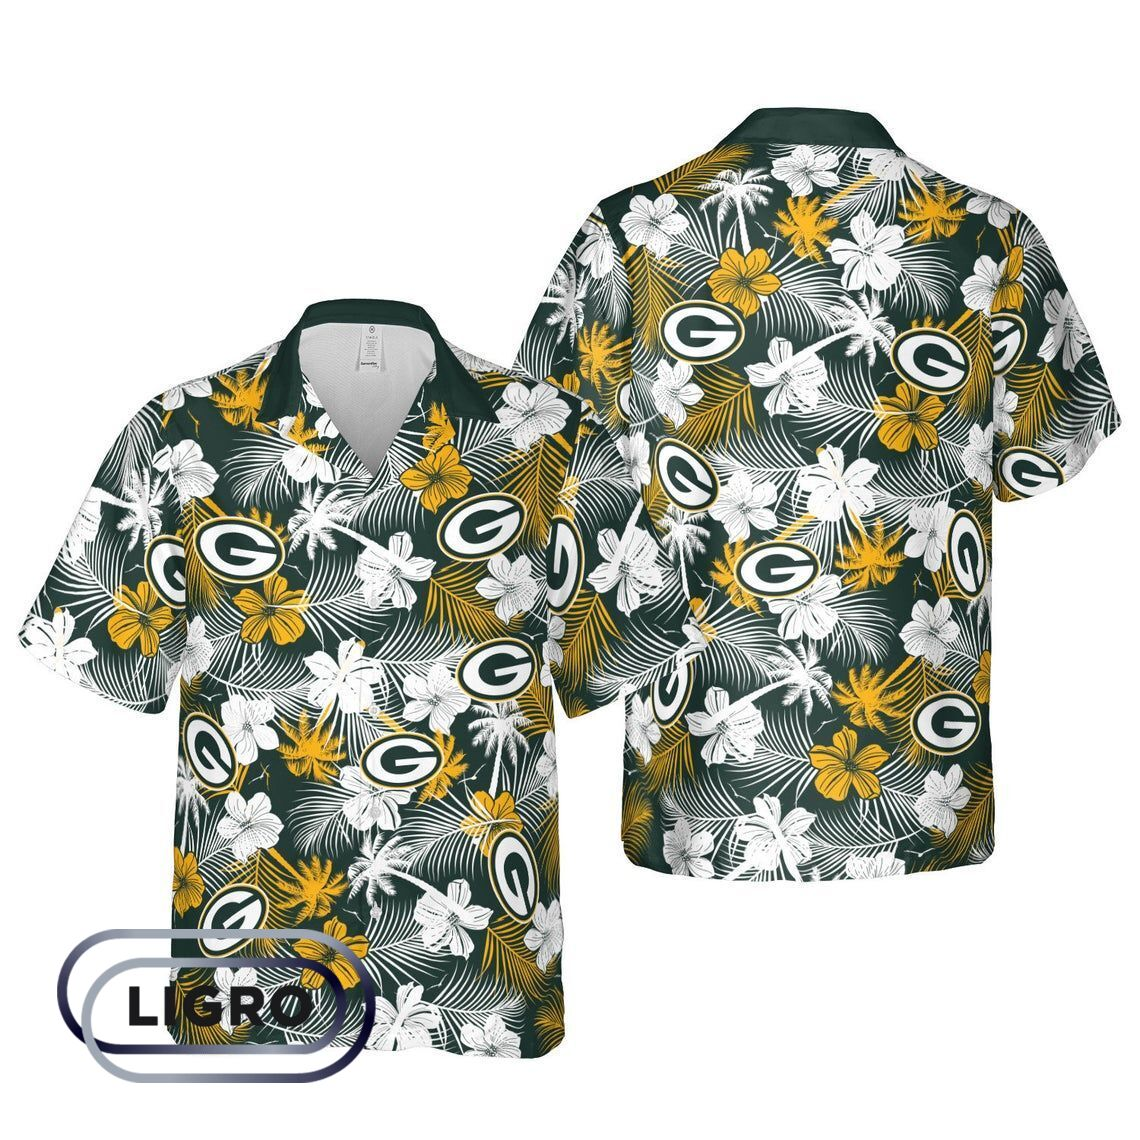 Green Bay Packers NFL Football Hawaiian Shirts